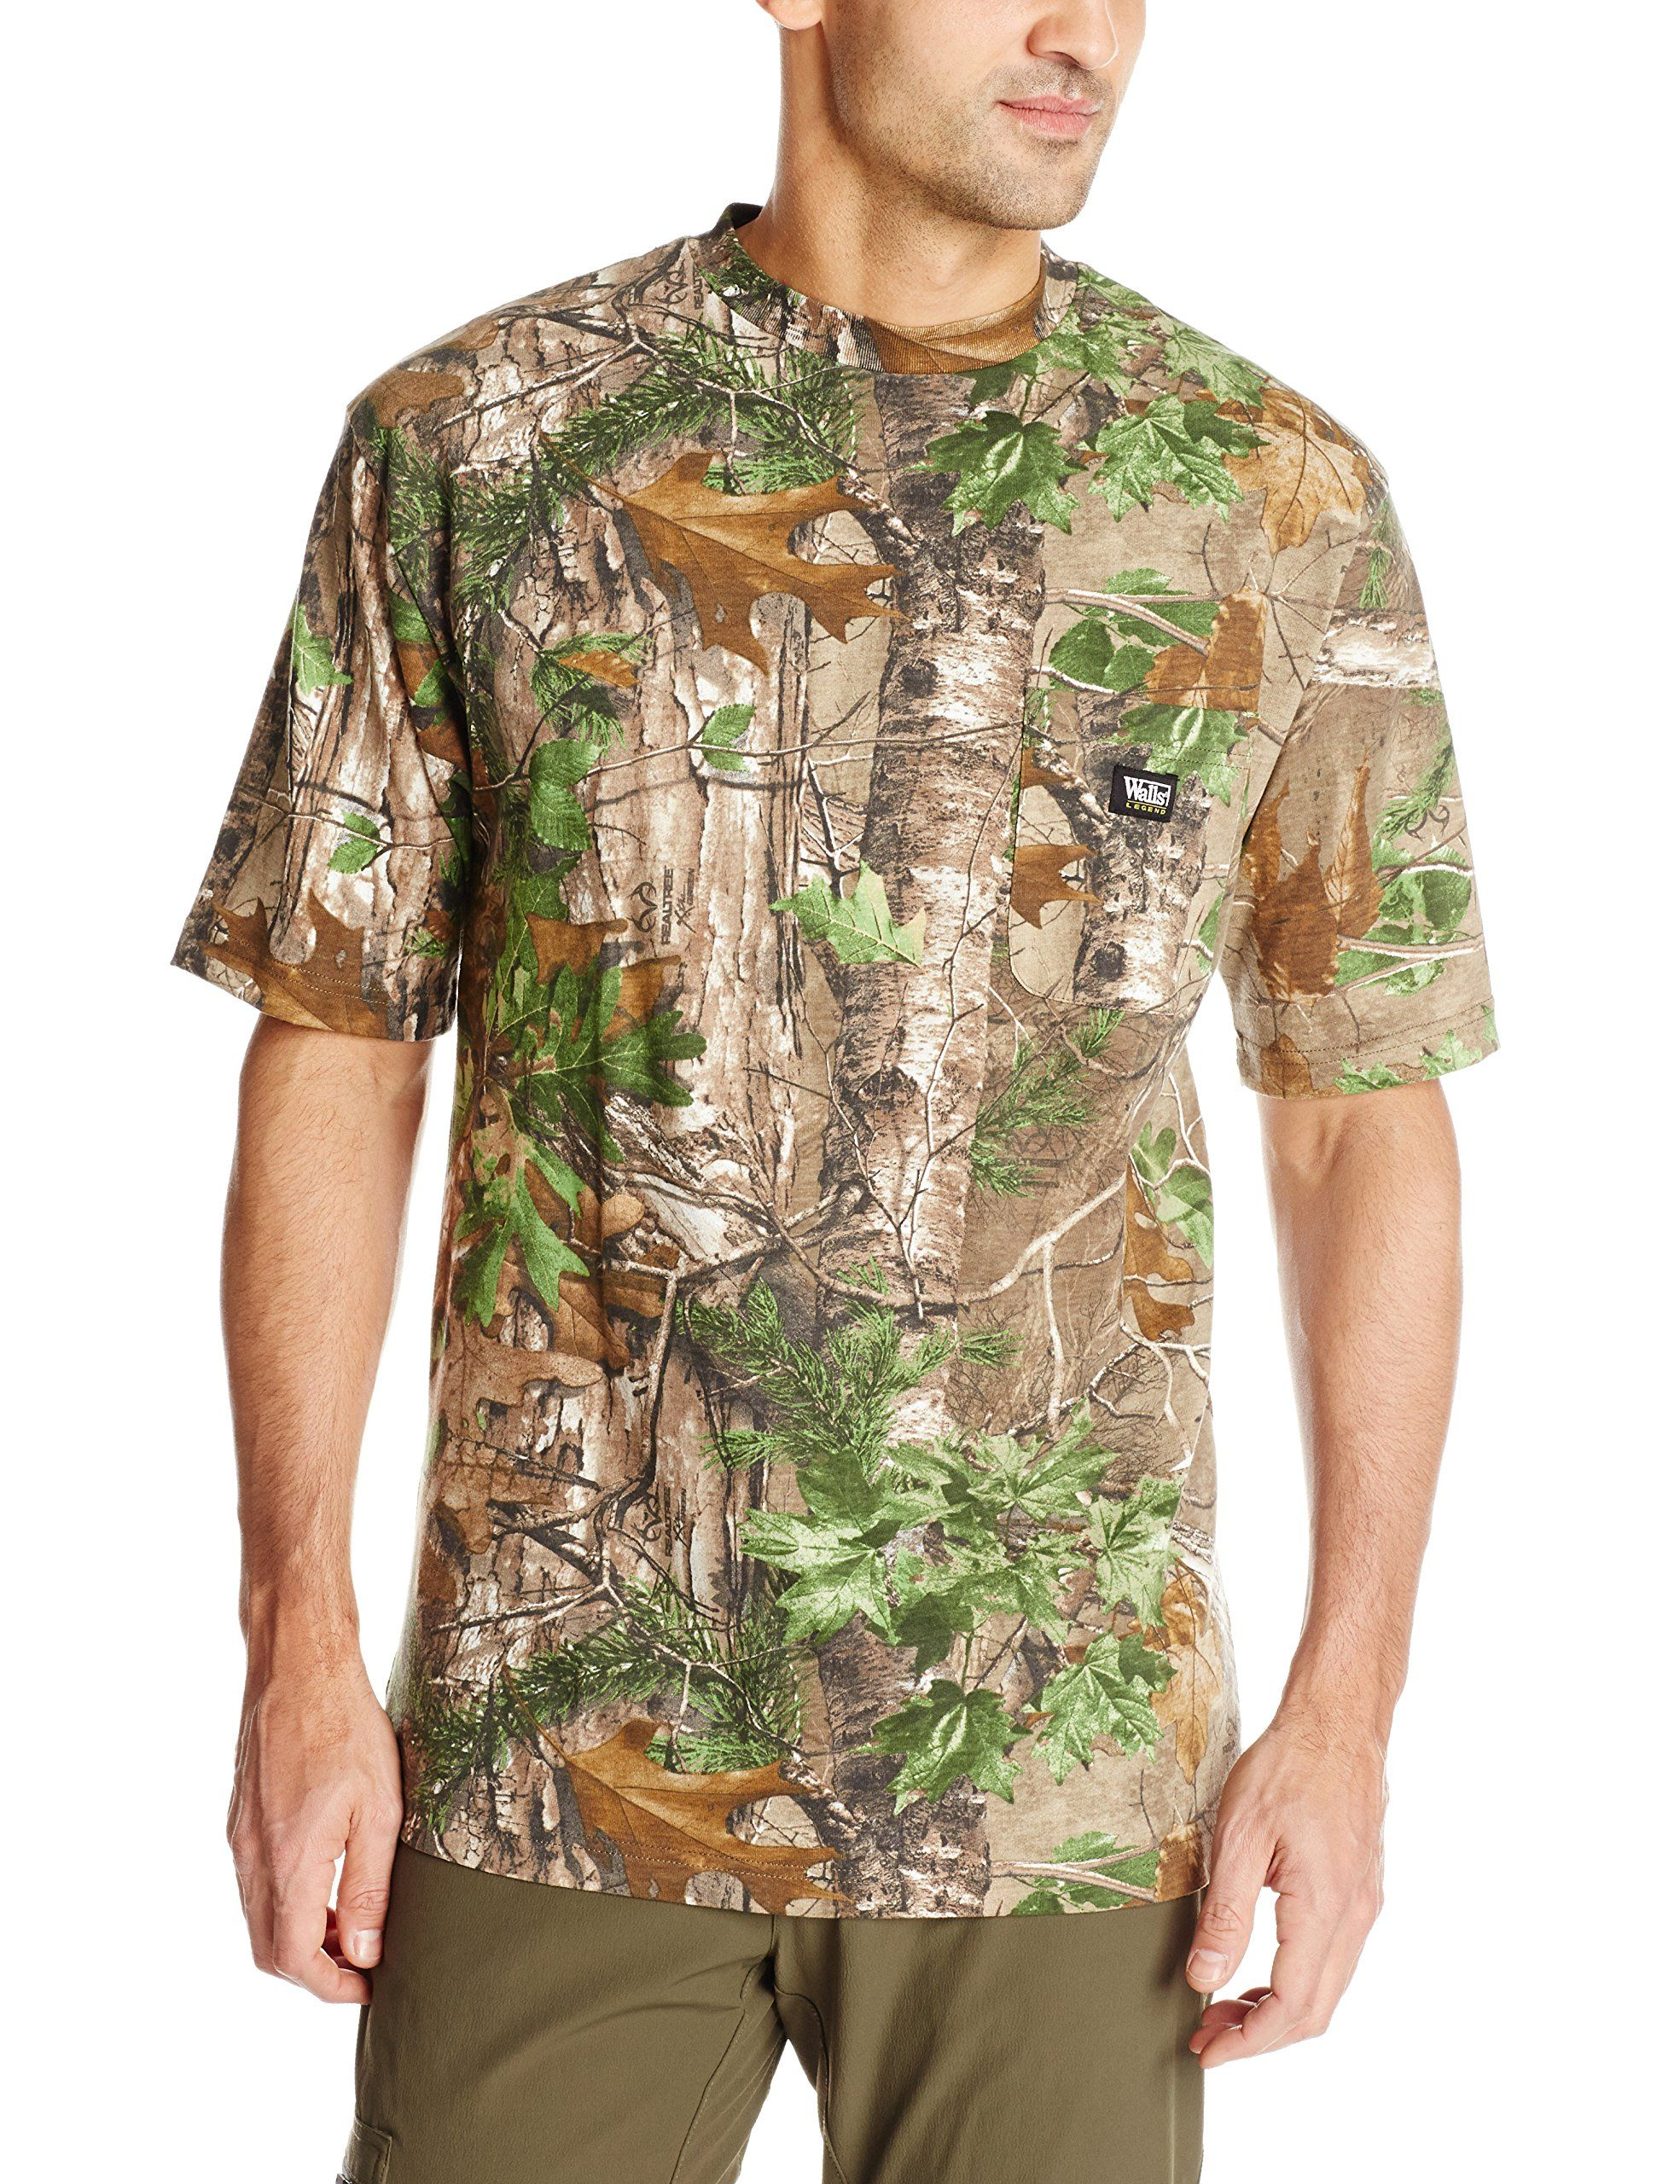 9a6246fa Walls Men's Short Sleeve Camo T-Shirt, Realtree Extra Green, X-Large ...